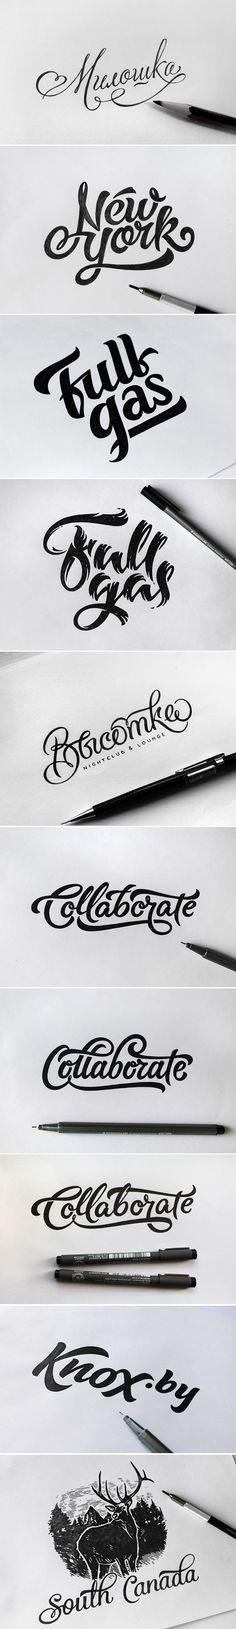 Sketch Vol. 2 on Behance